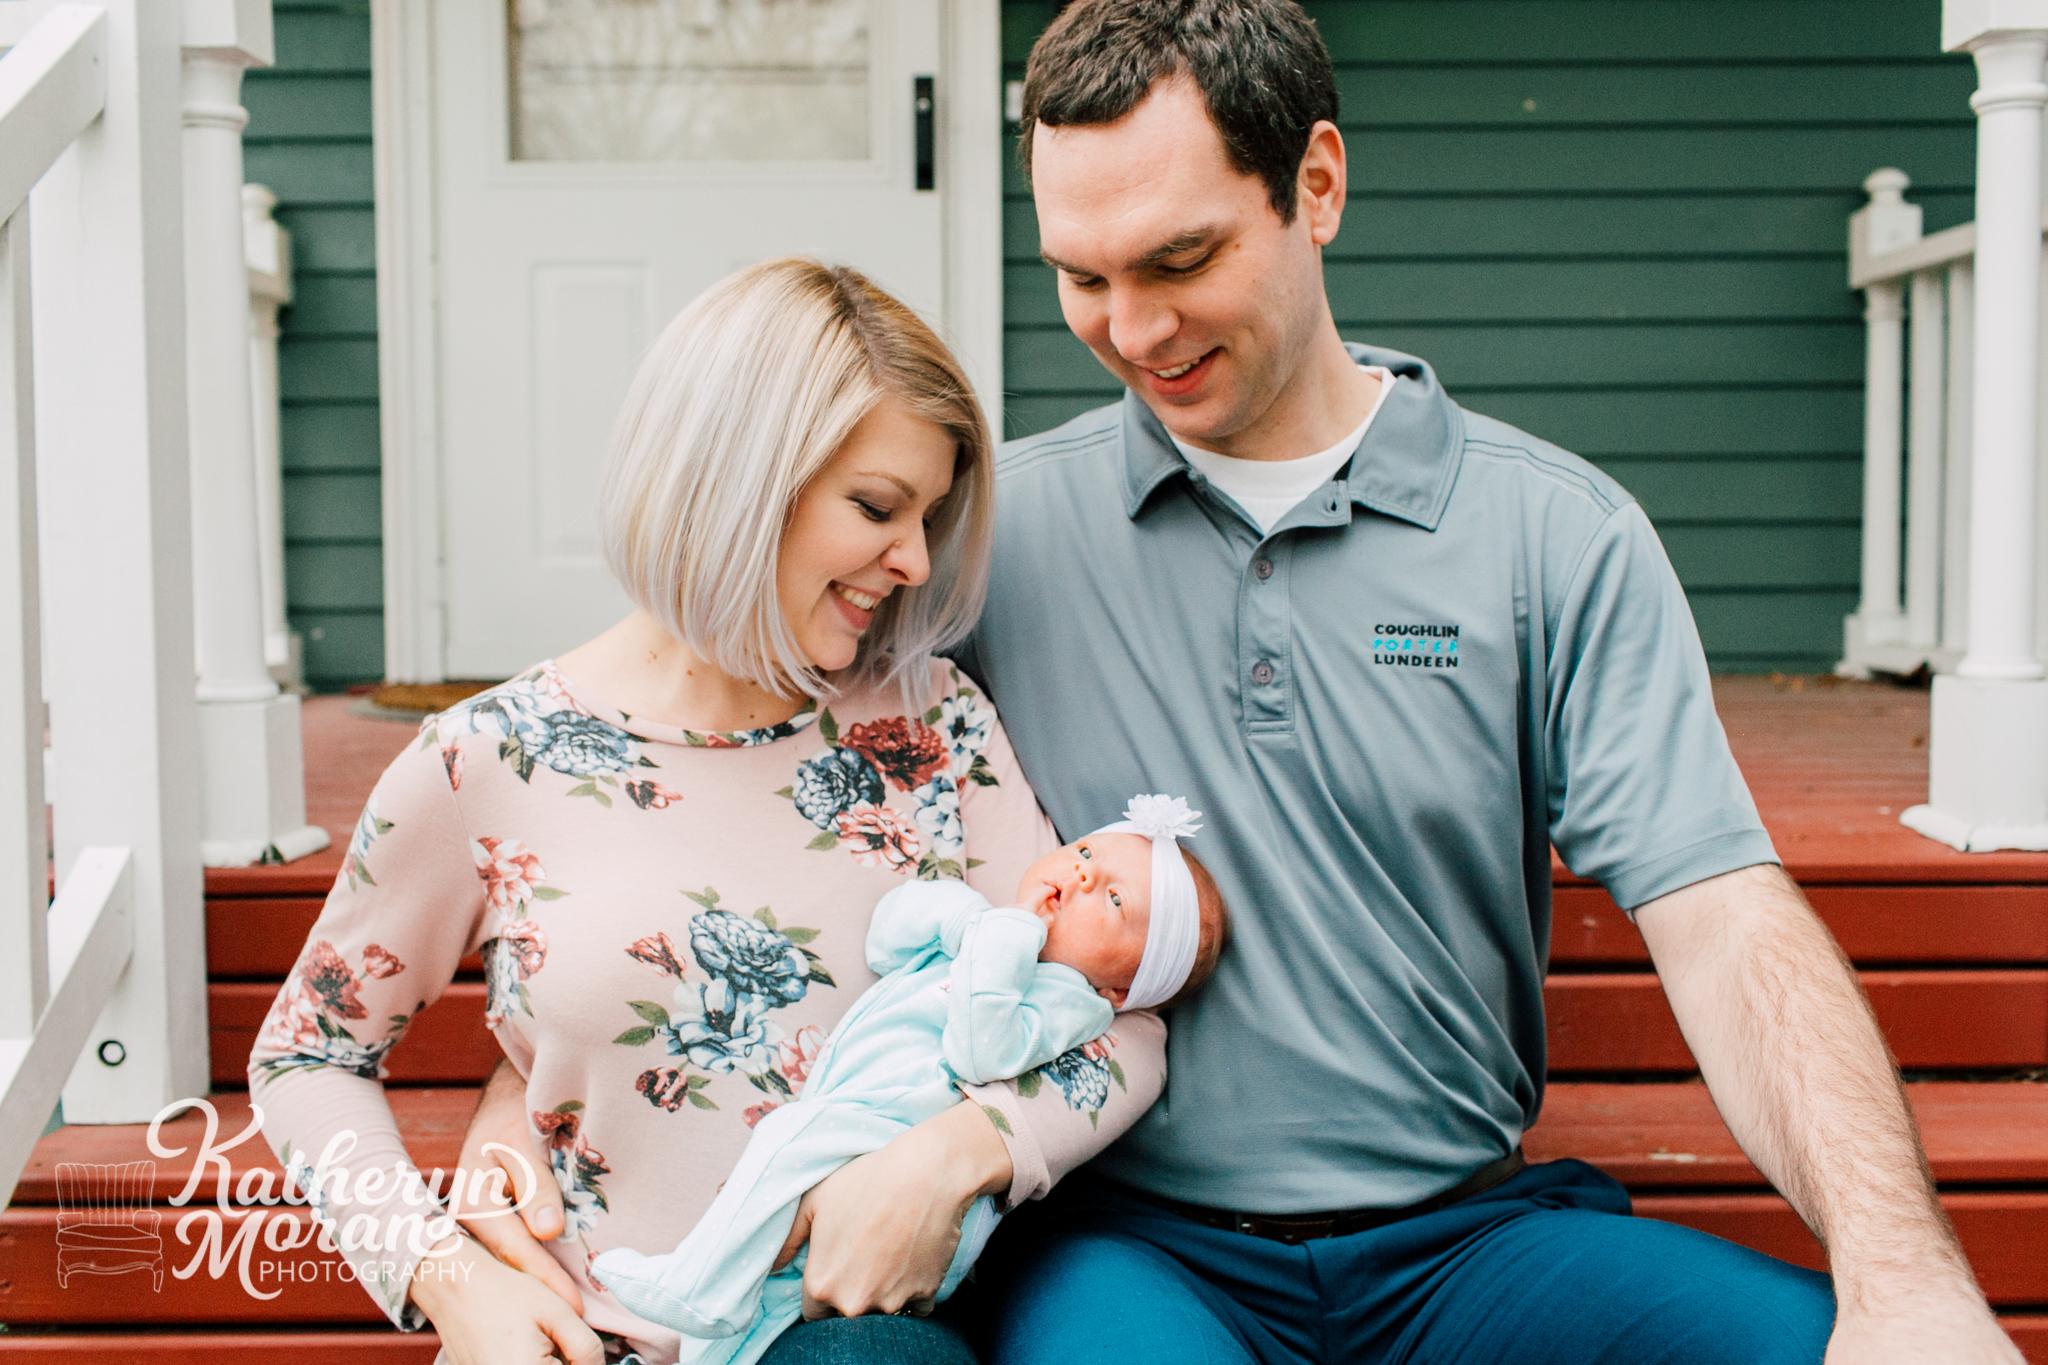 seattle-newborn-photographer-katheryn-moran-avery-malaspino-18.jpg